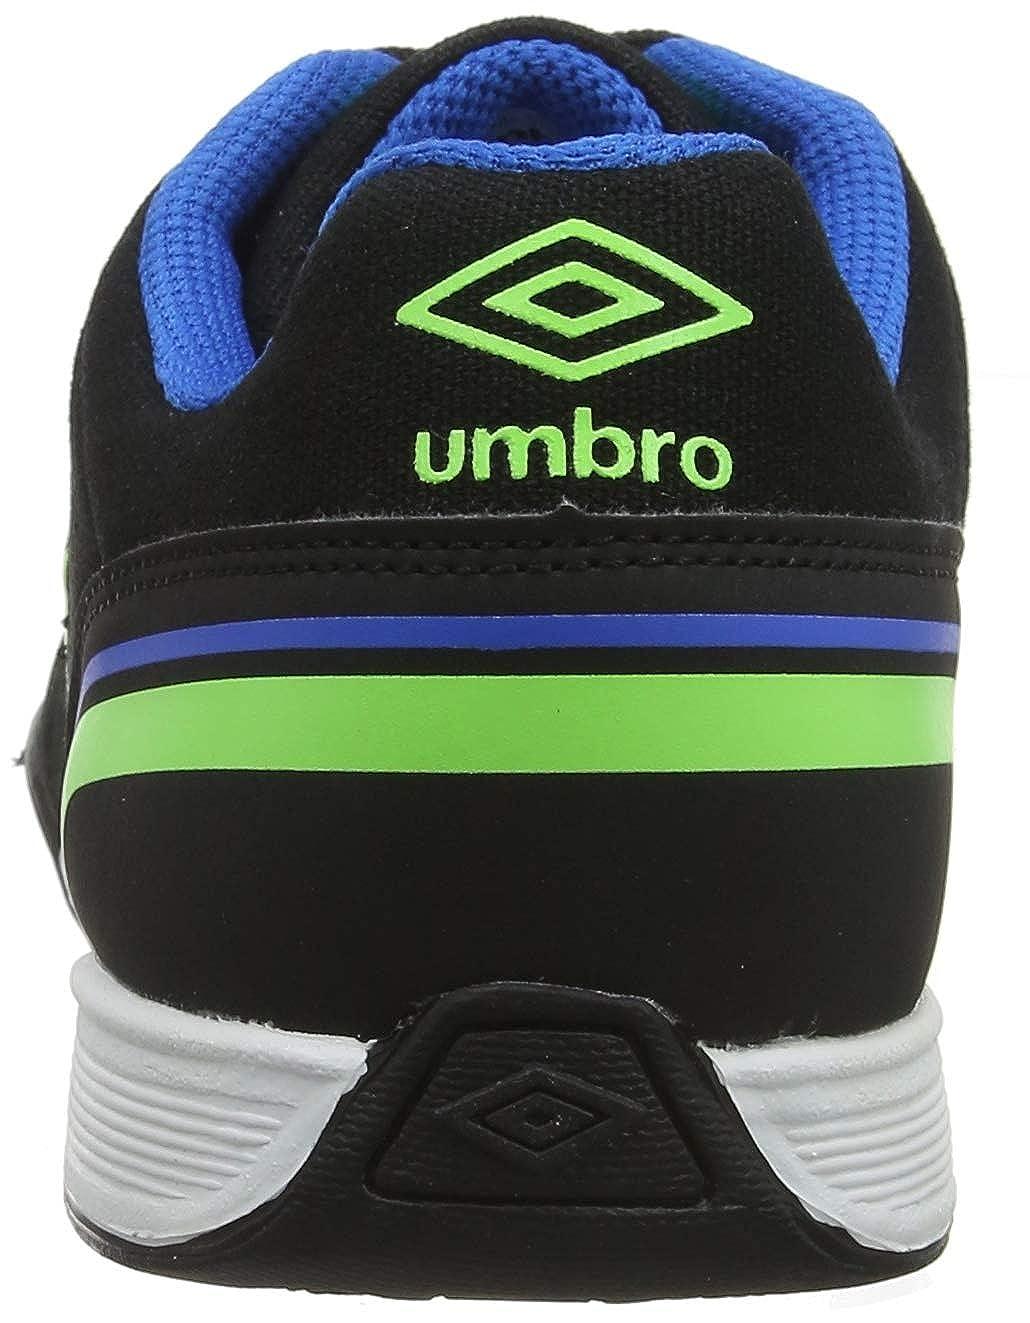 Negro Umbro Futsal Street V Black//Green Gecko//Electric Blue FCH 41 EU Zapatillas de f?tbol Sala para Hombre